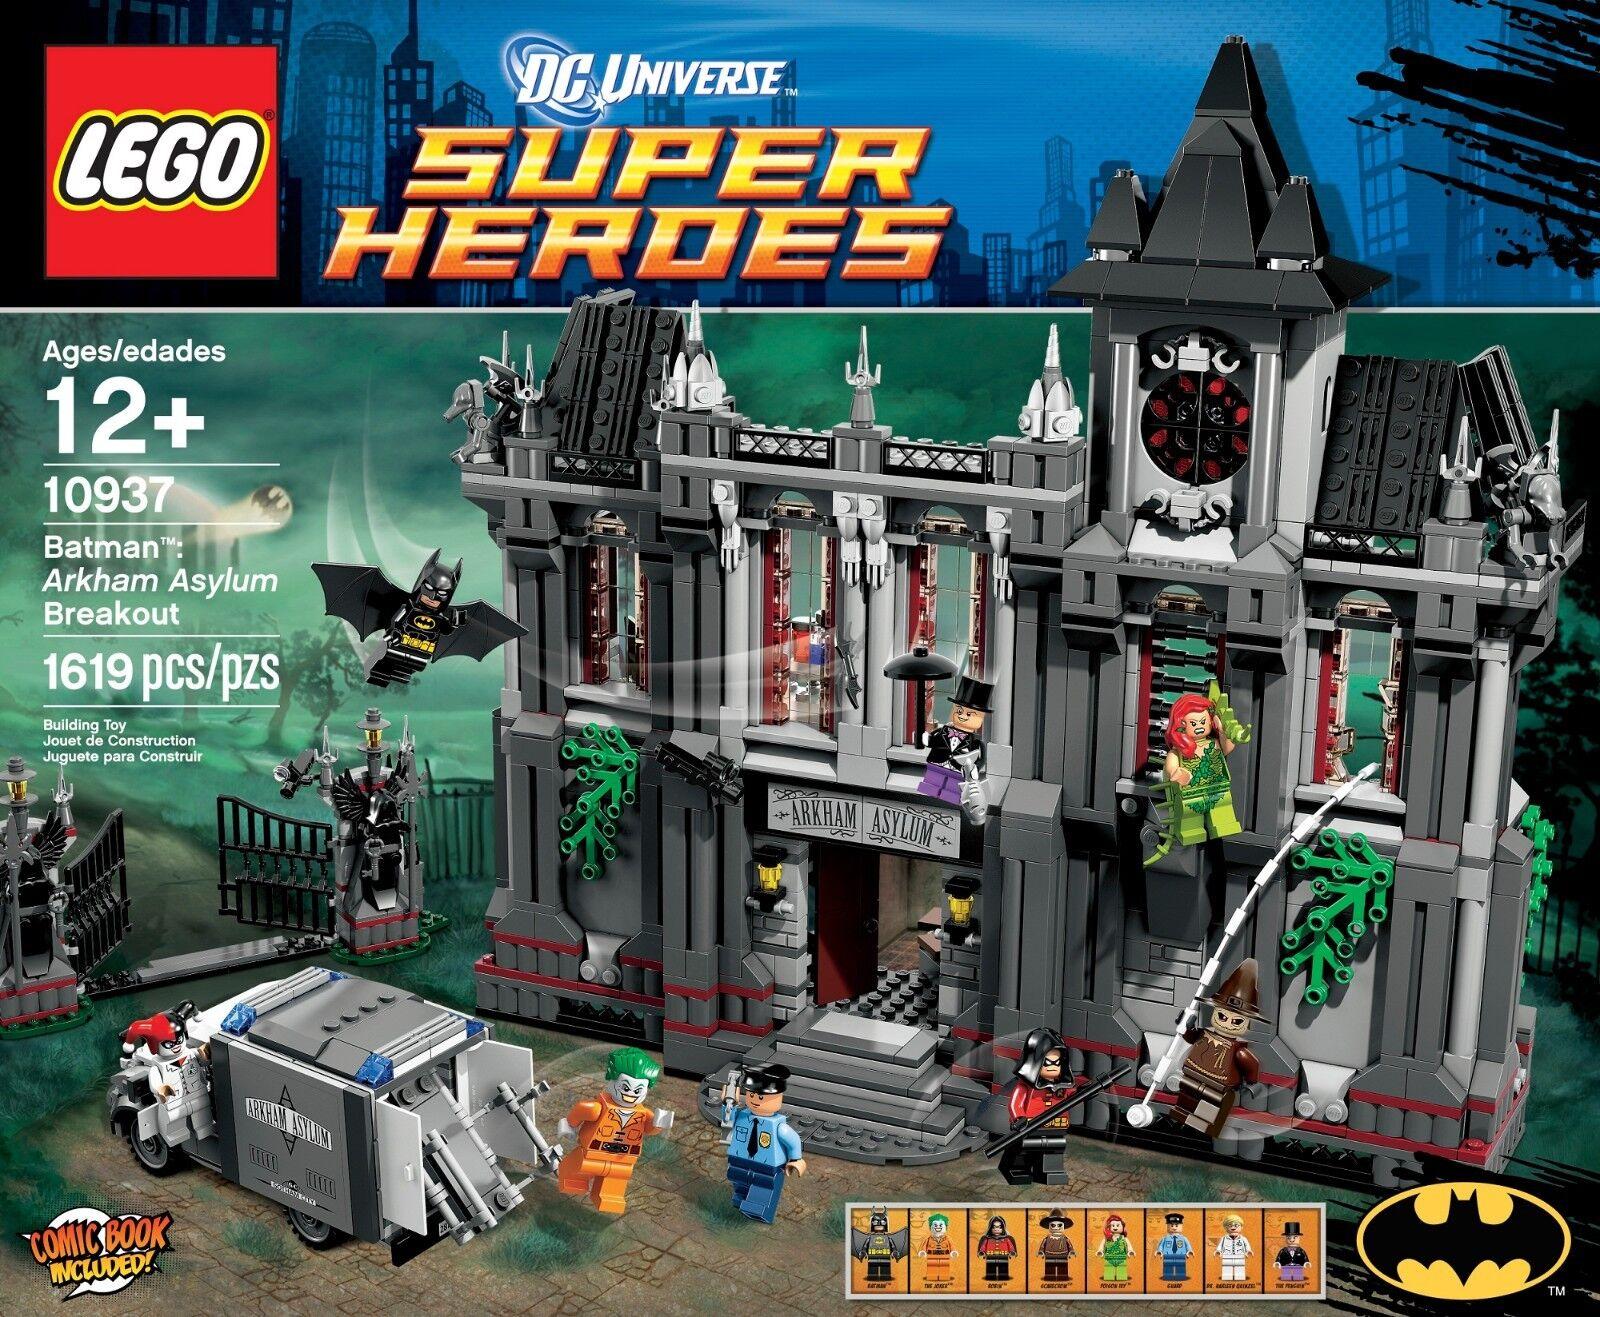 Lego Universe Super Heroes Batman Arkham Asylum Breakout Set 10937 BNIB - Rare